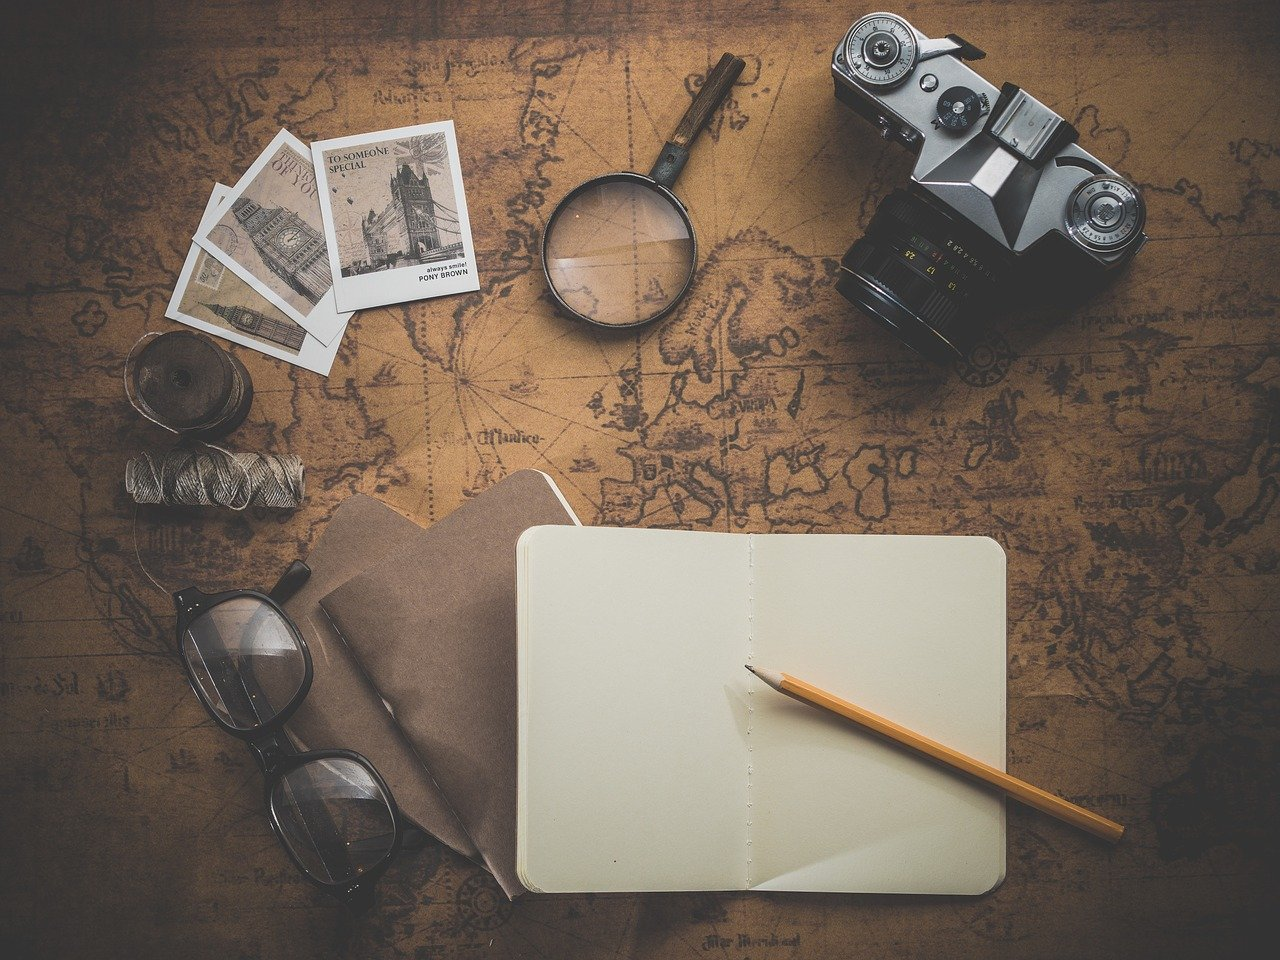 preparing a trip